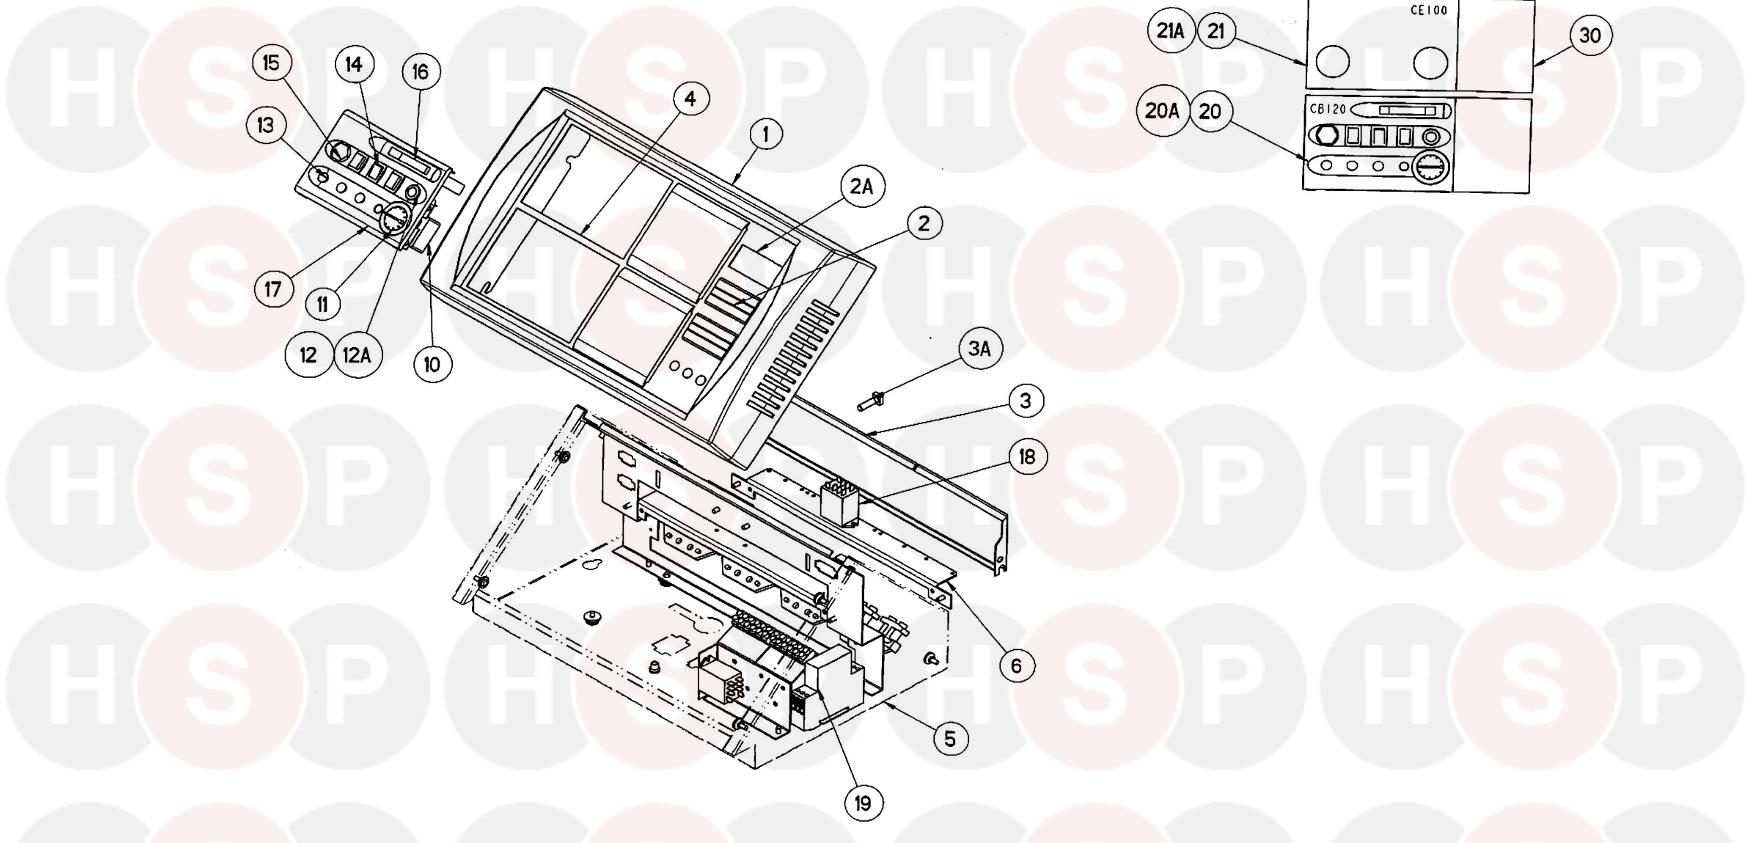 Potterton NXR4 9-17 Section (CONTROL PANEL WHITE CASING